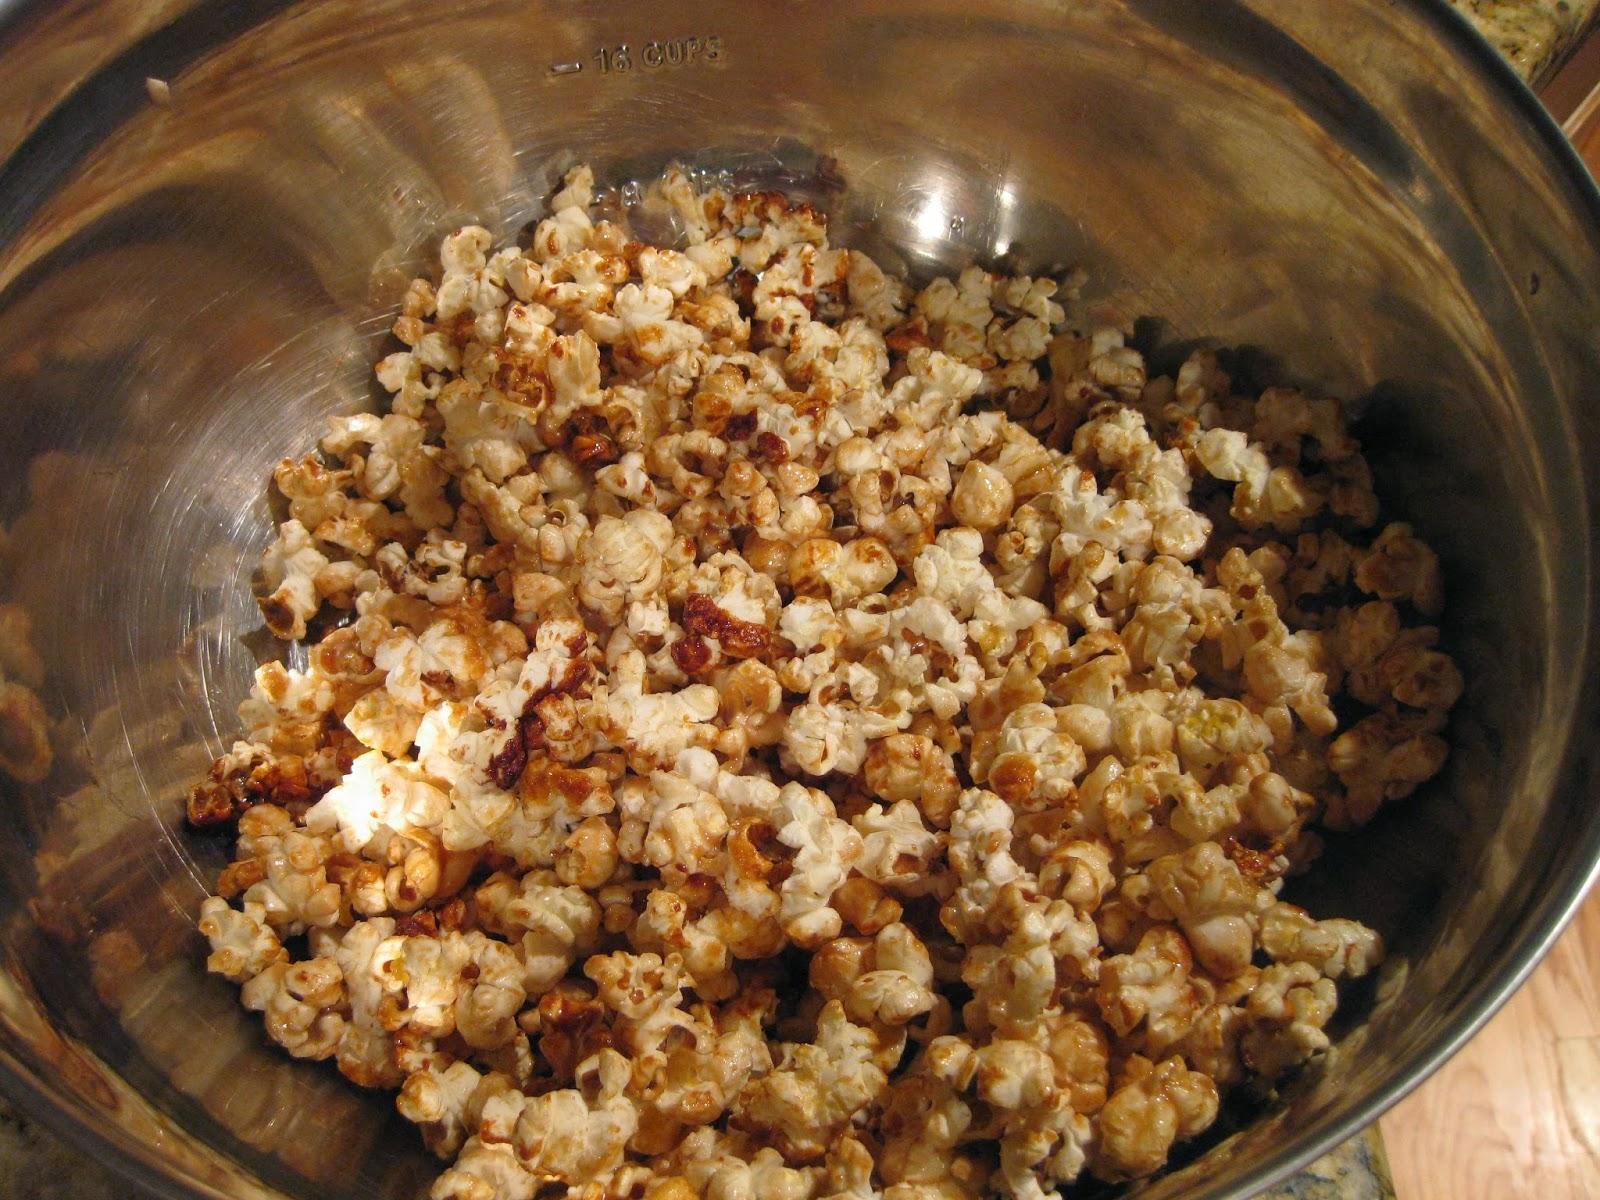 Oishikatta 美味しかった: Kettle corn